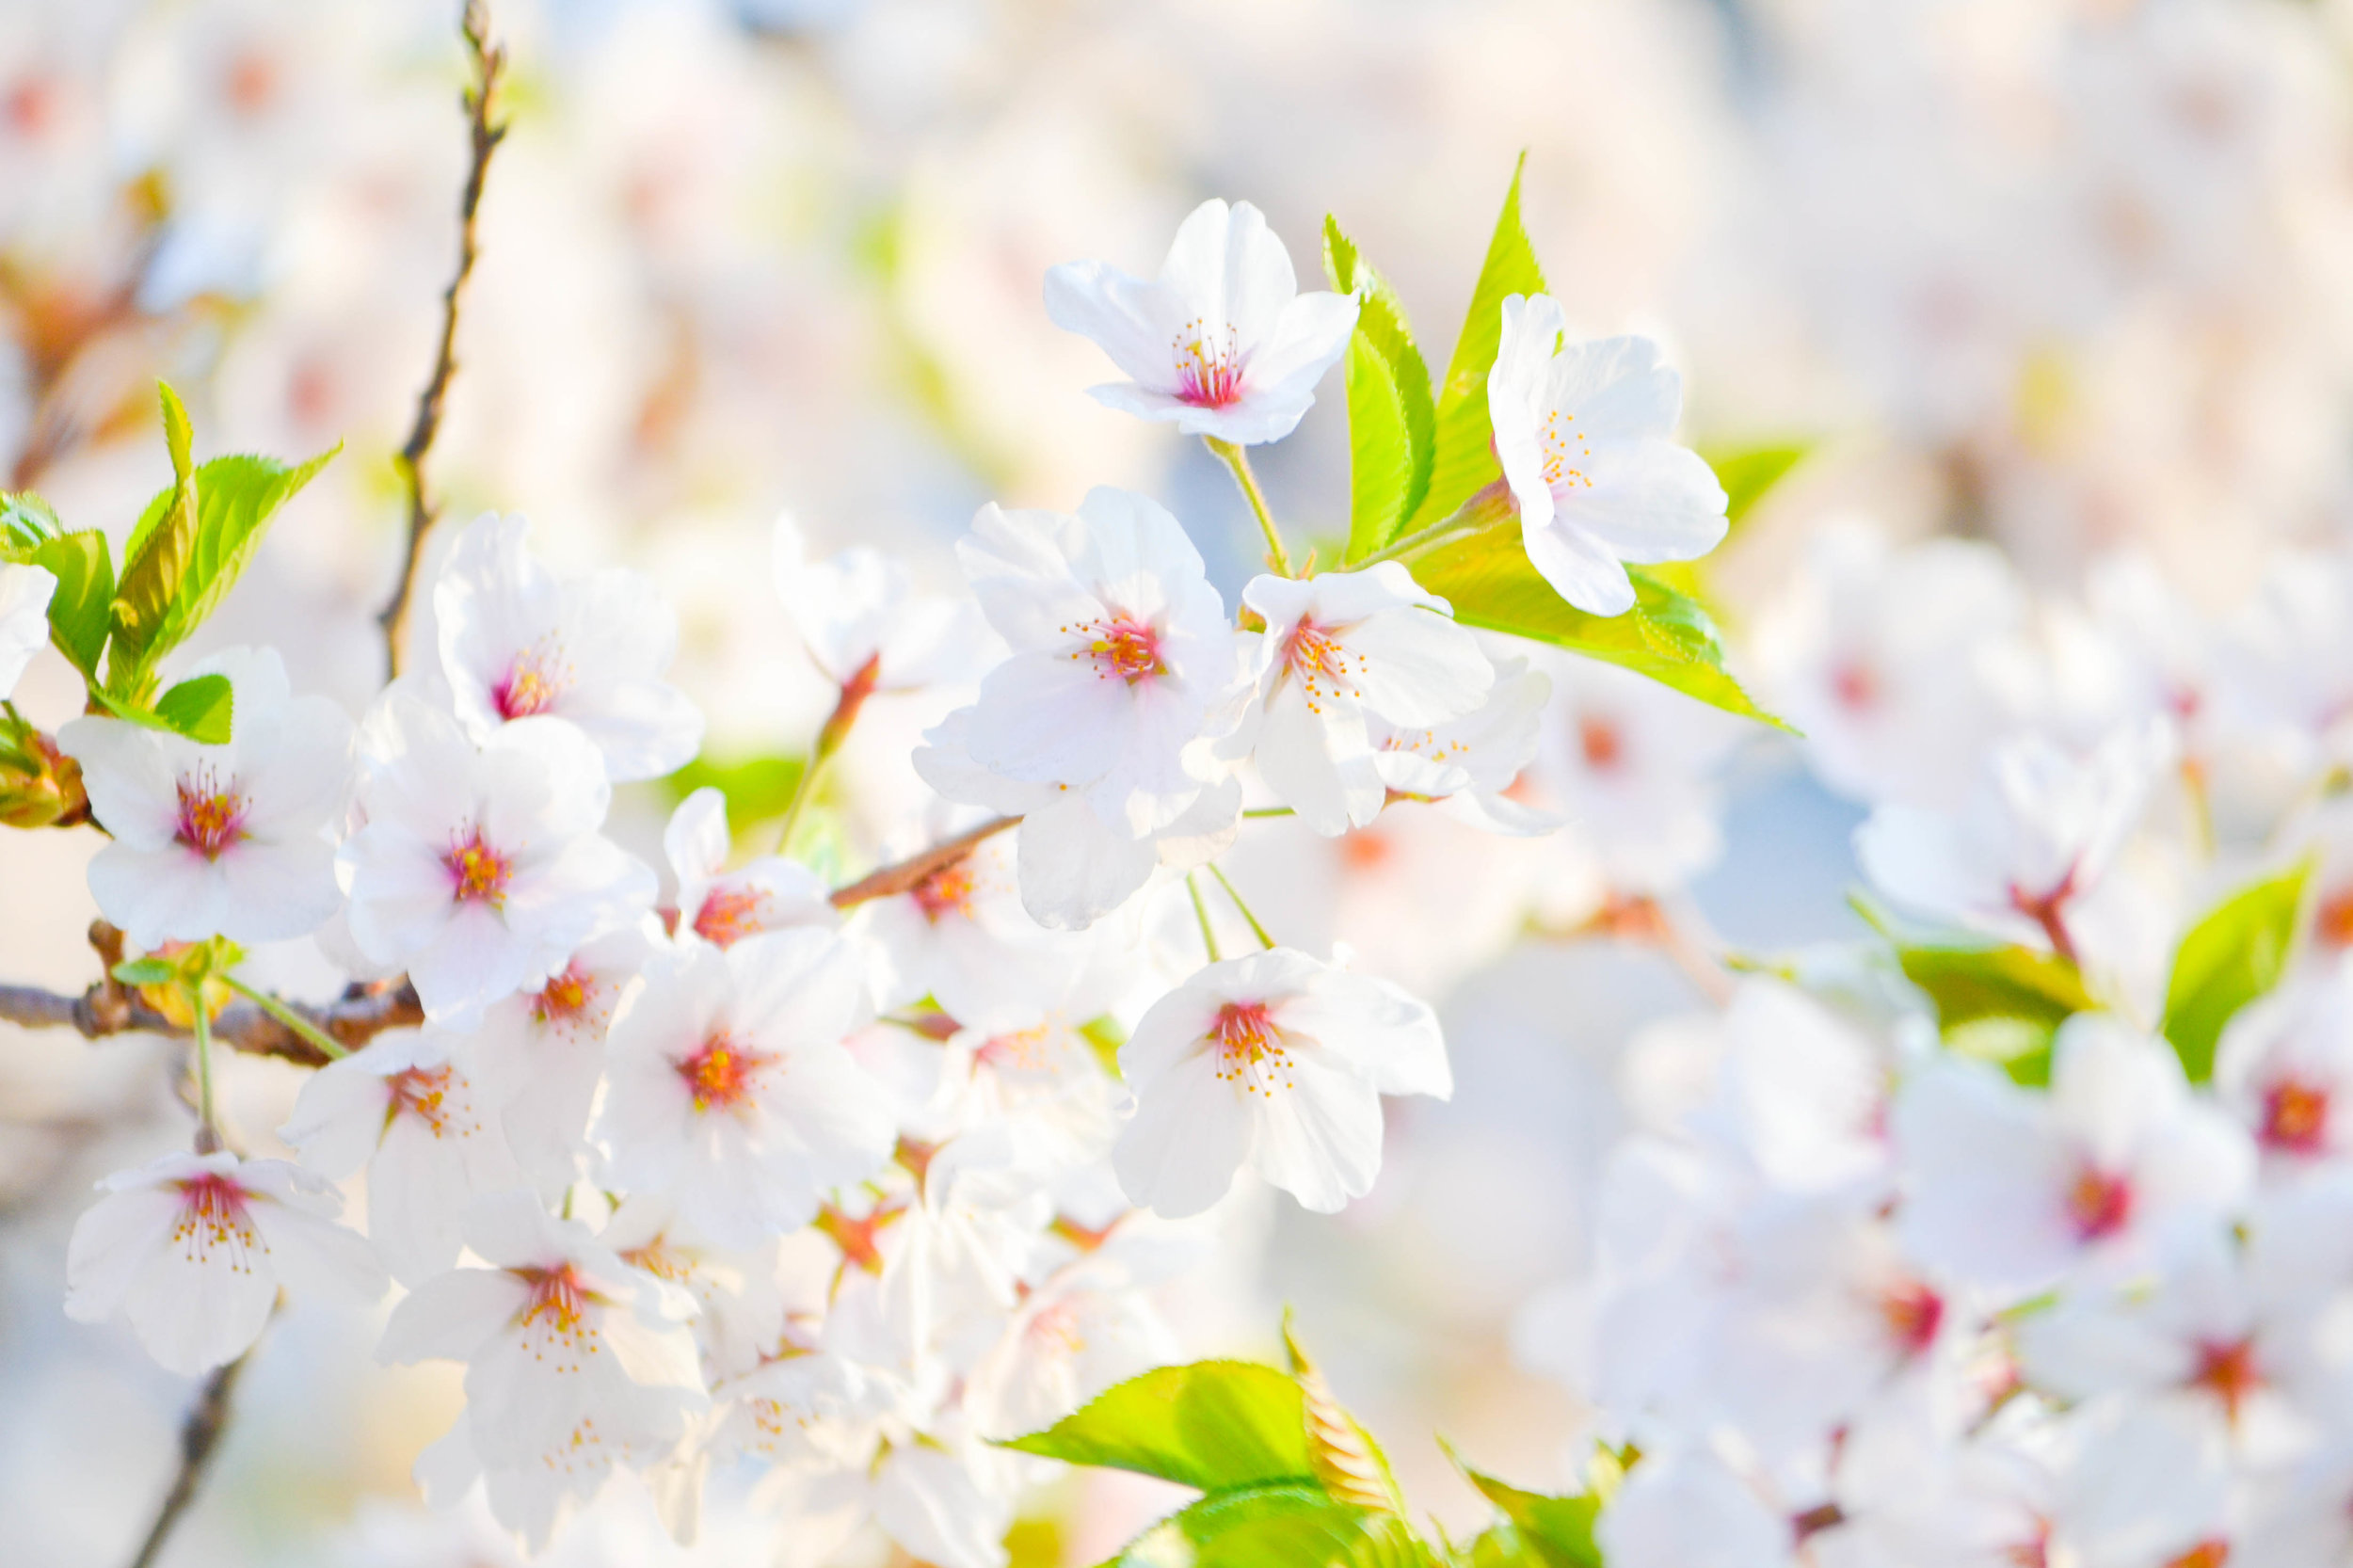 spring_break_march_madness_spring_forward_spring_bloom_flowering_tree_how_to_photograph_flowering_trees_white_bloom-1291265.jpg